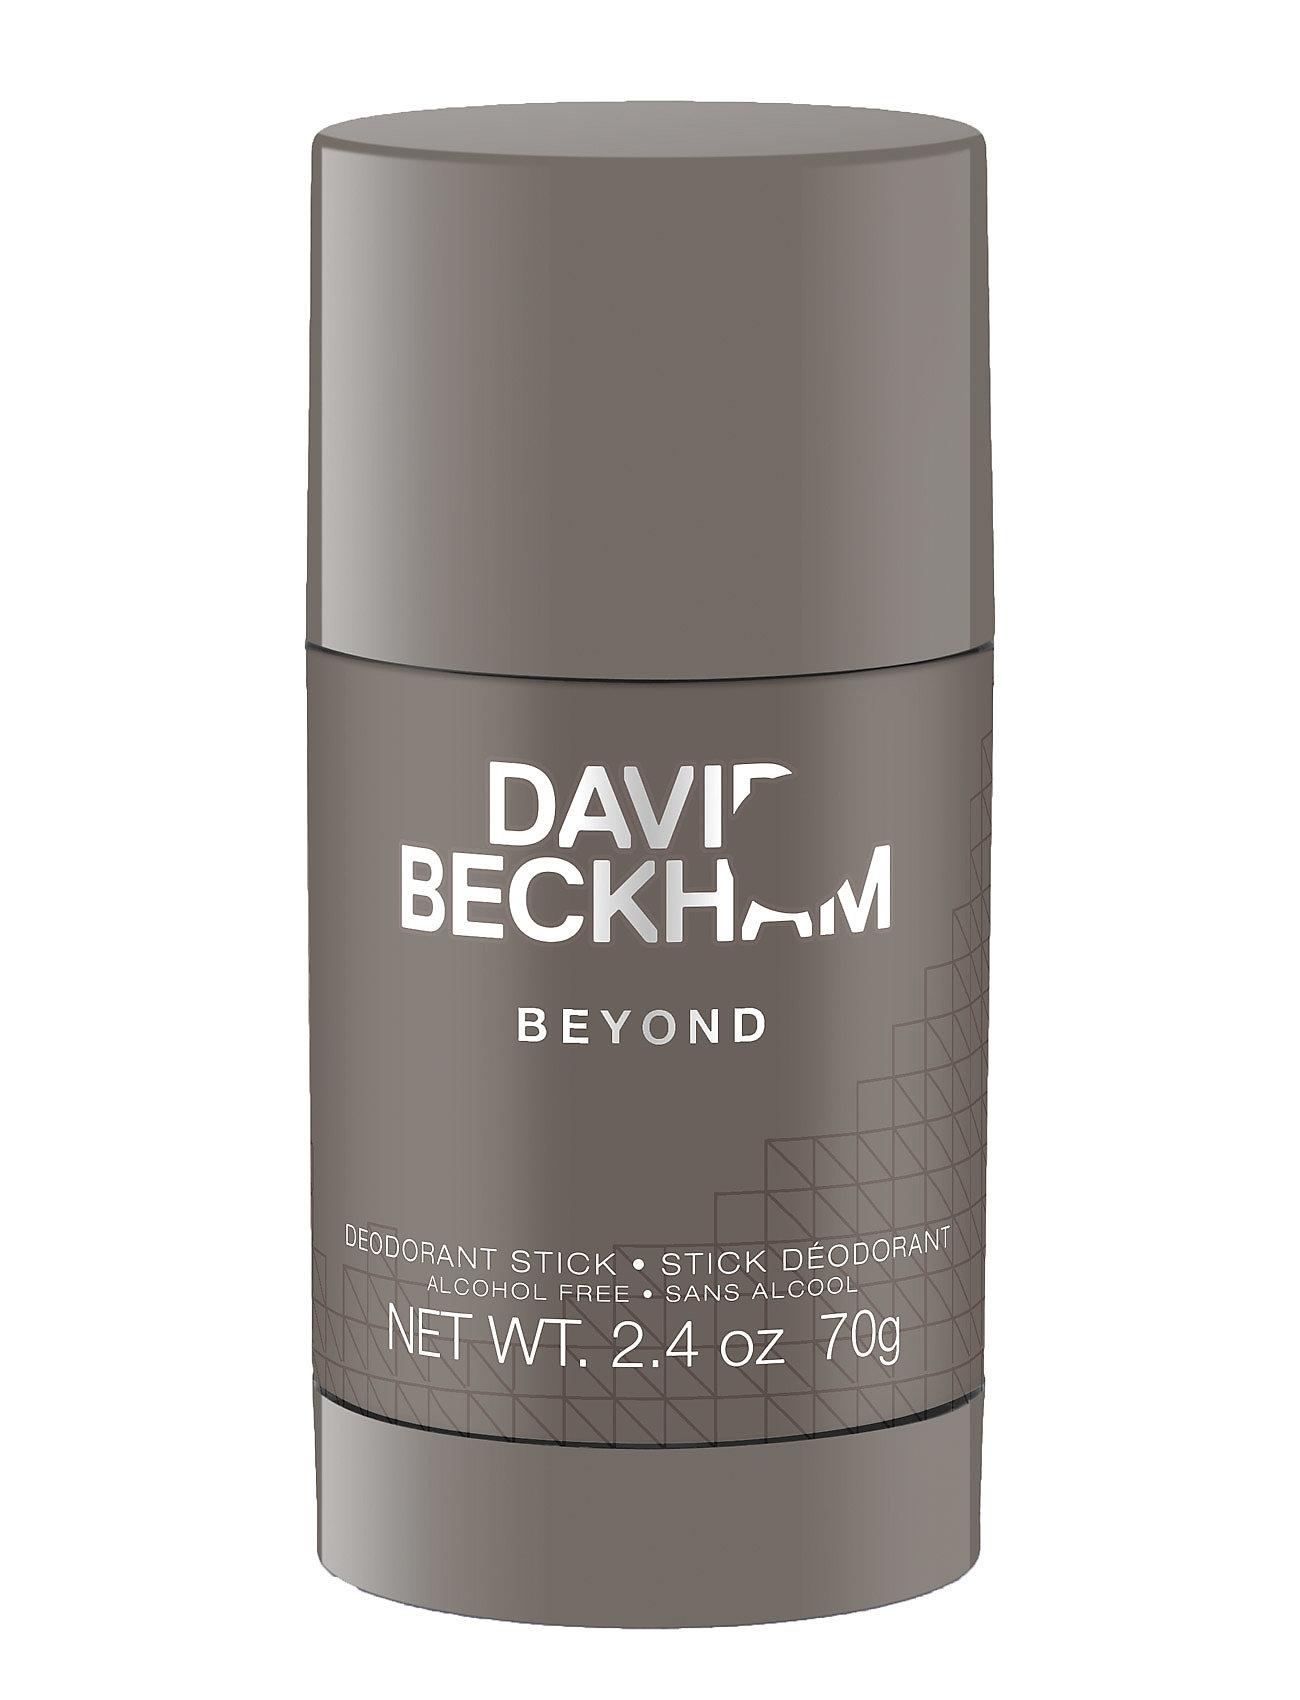 david beckham – David beckham beyond deodorant stic på boozt.com dk